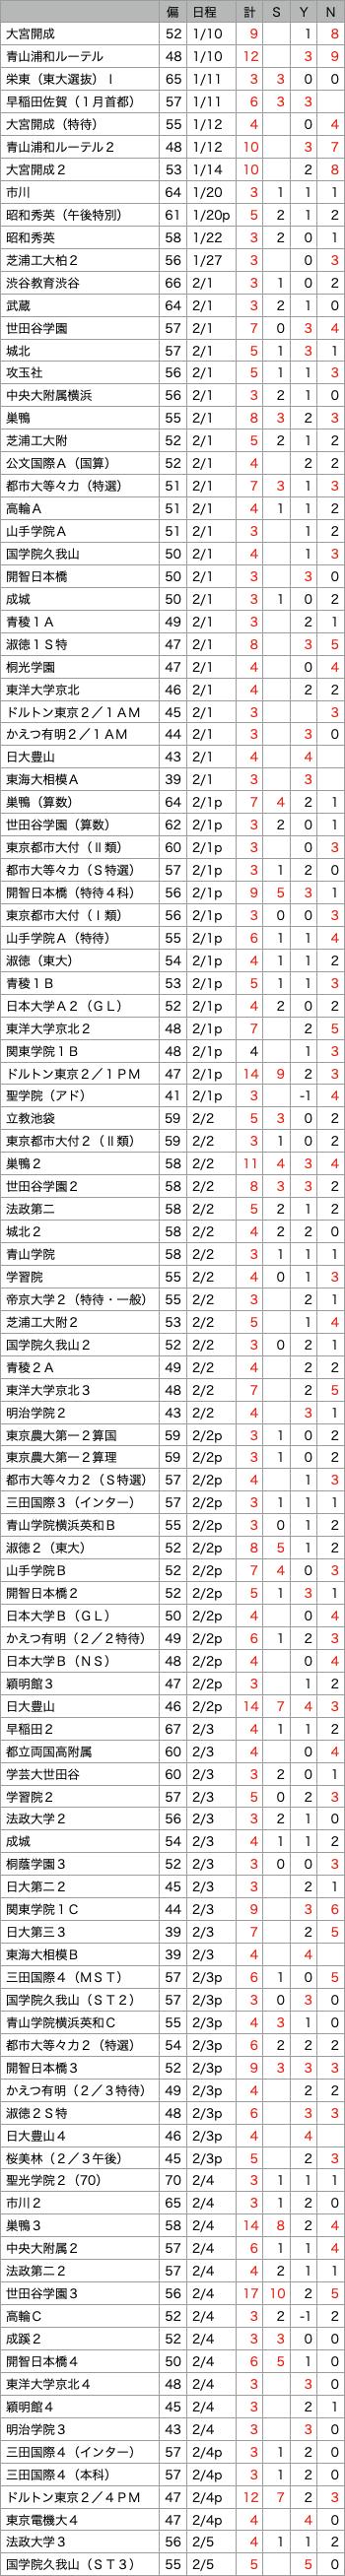 https://e-tutor.tokyo/data/20200821/06.png